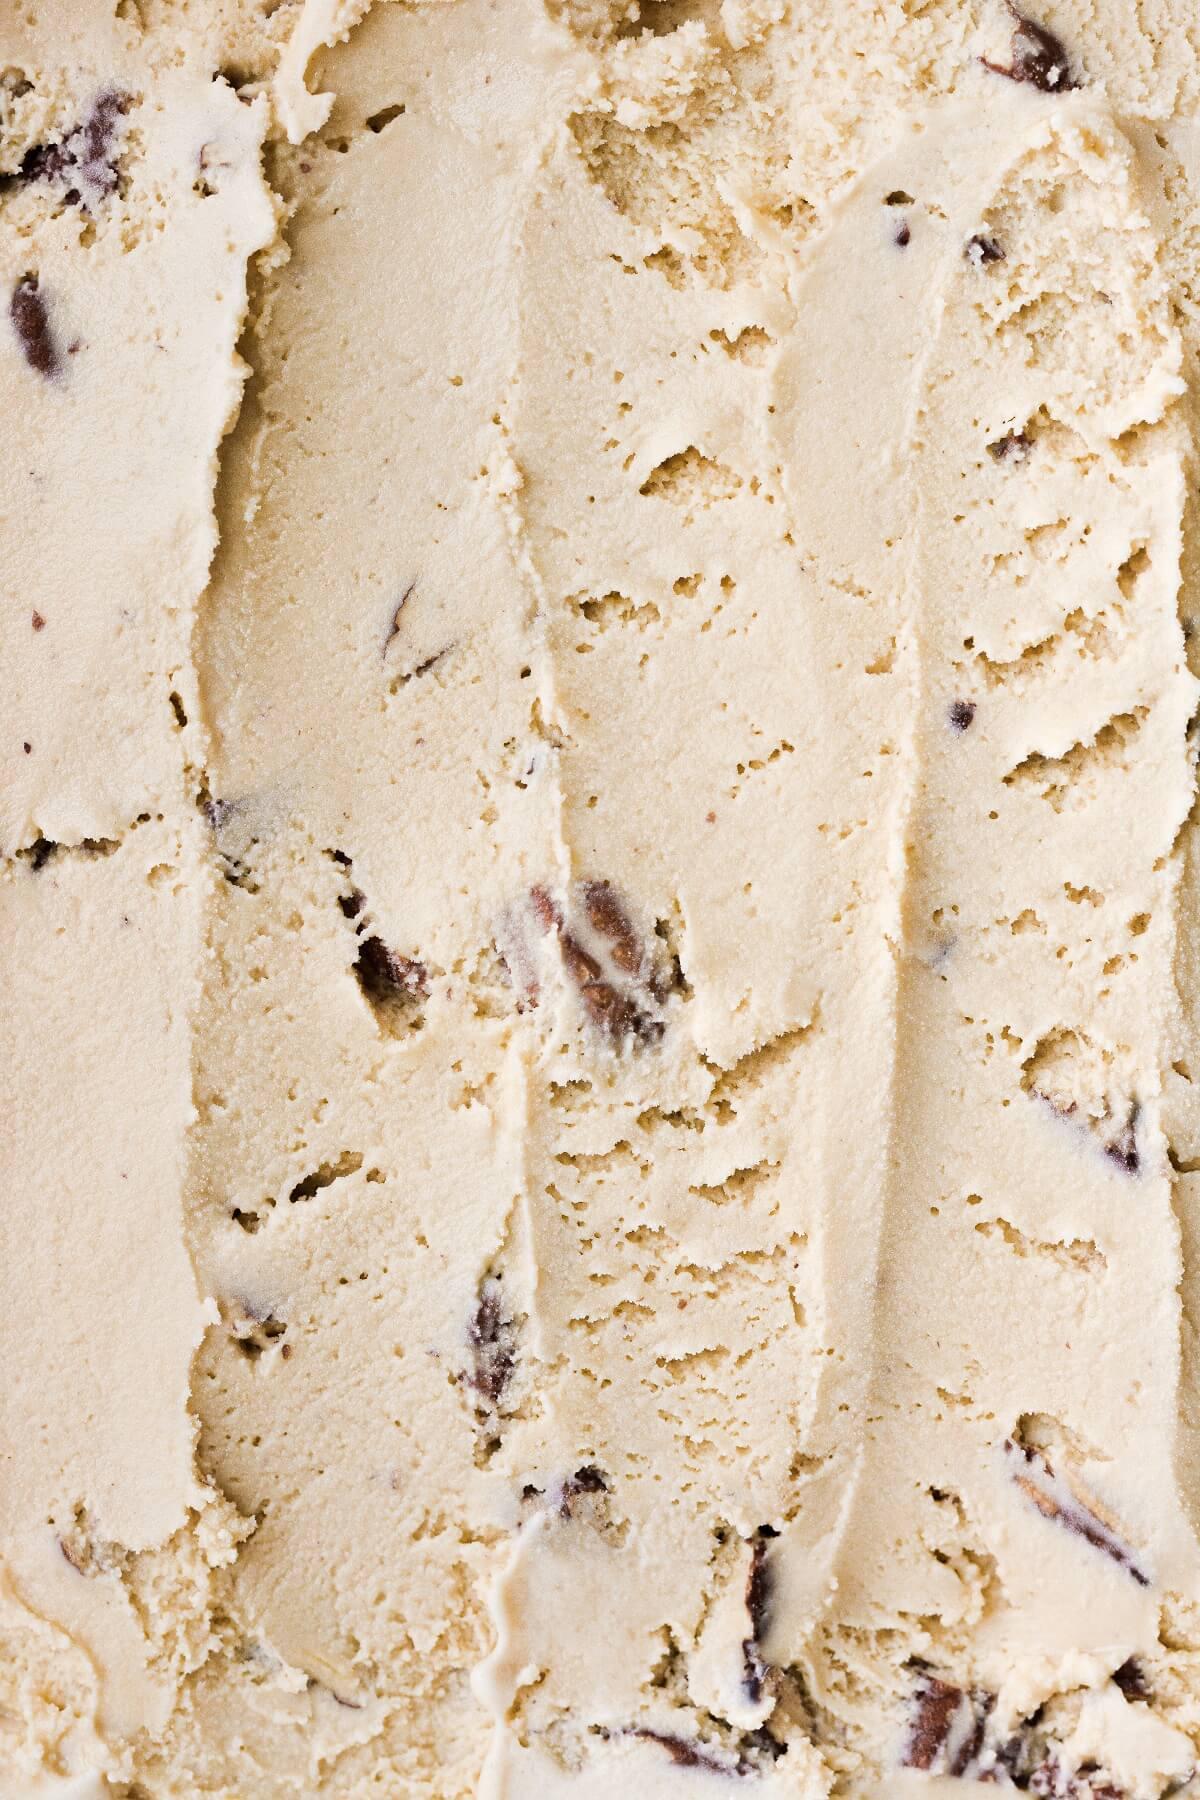 Closeup of homemade butter pecan ice cream.